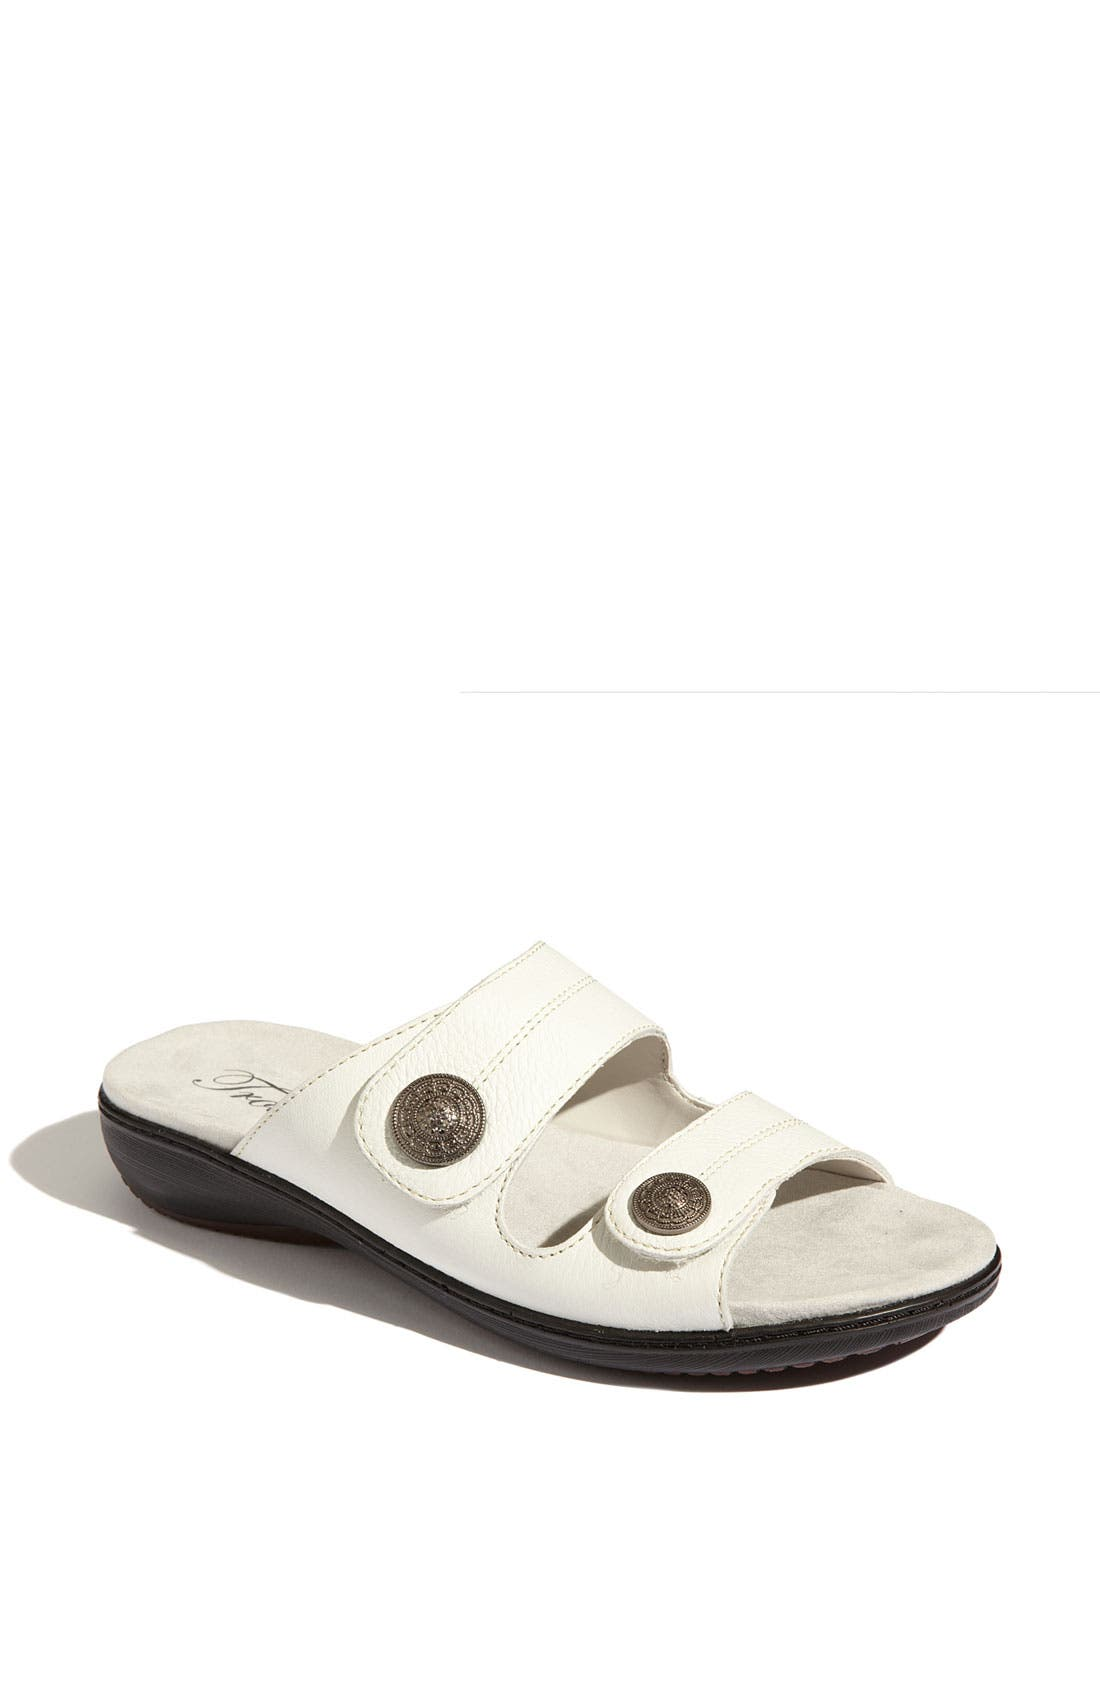 Main Image - Trotters 'Kassie' Sandal